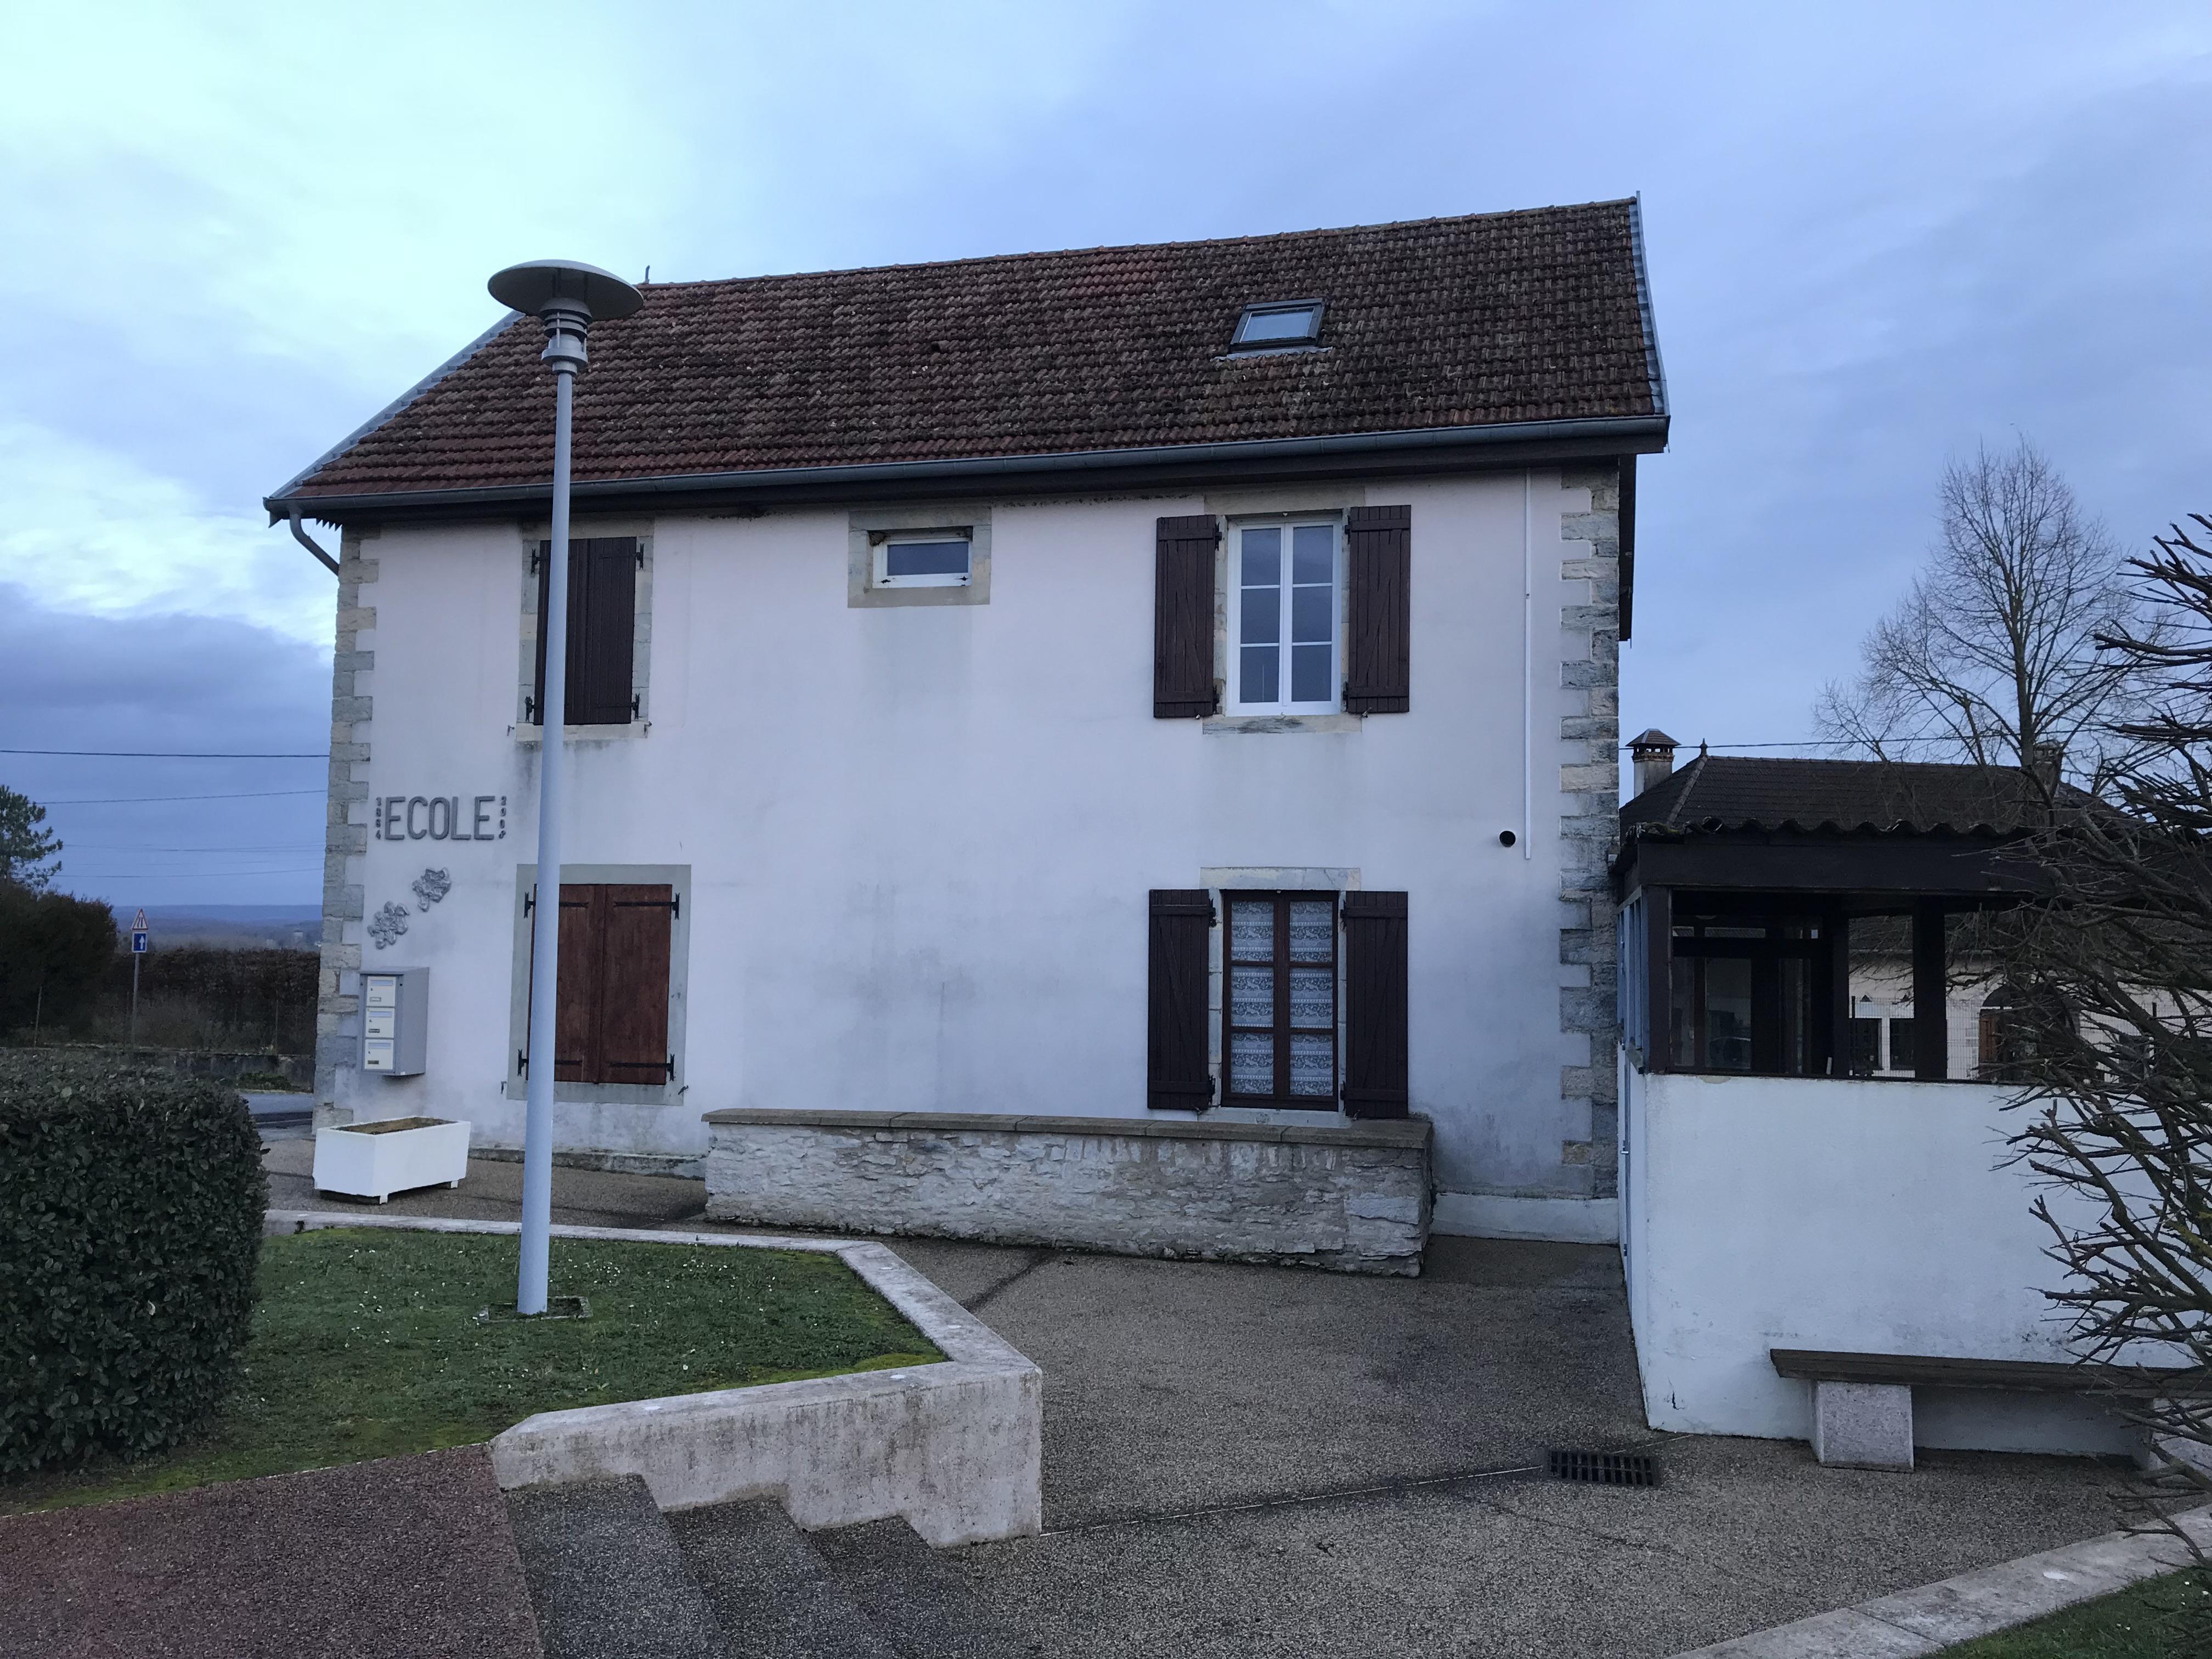 La Maison Du Bois Clairvaux la barre, jura - wikipedia